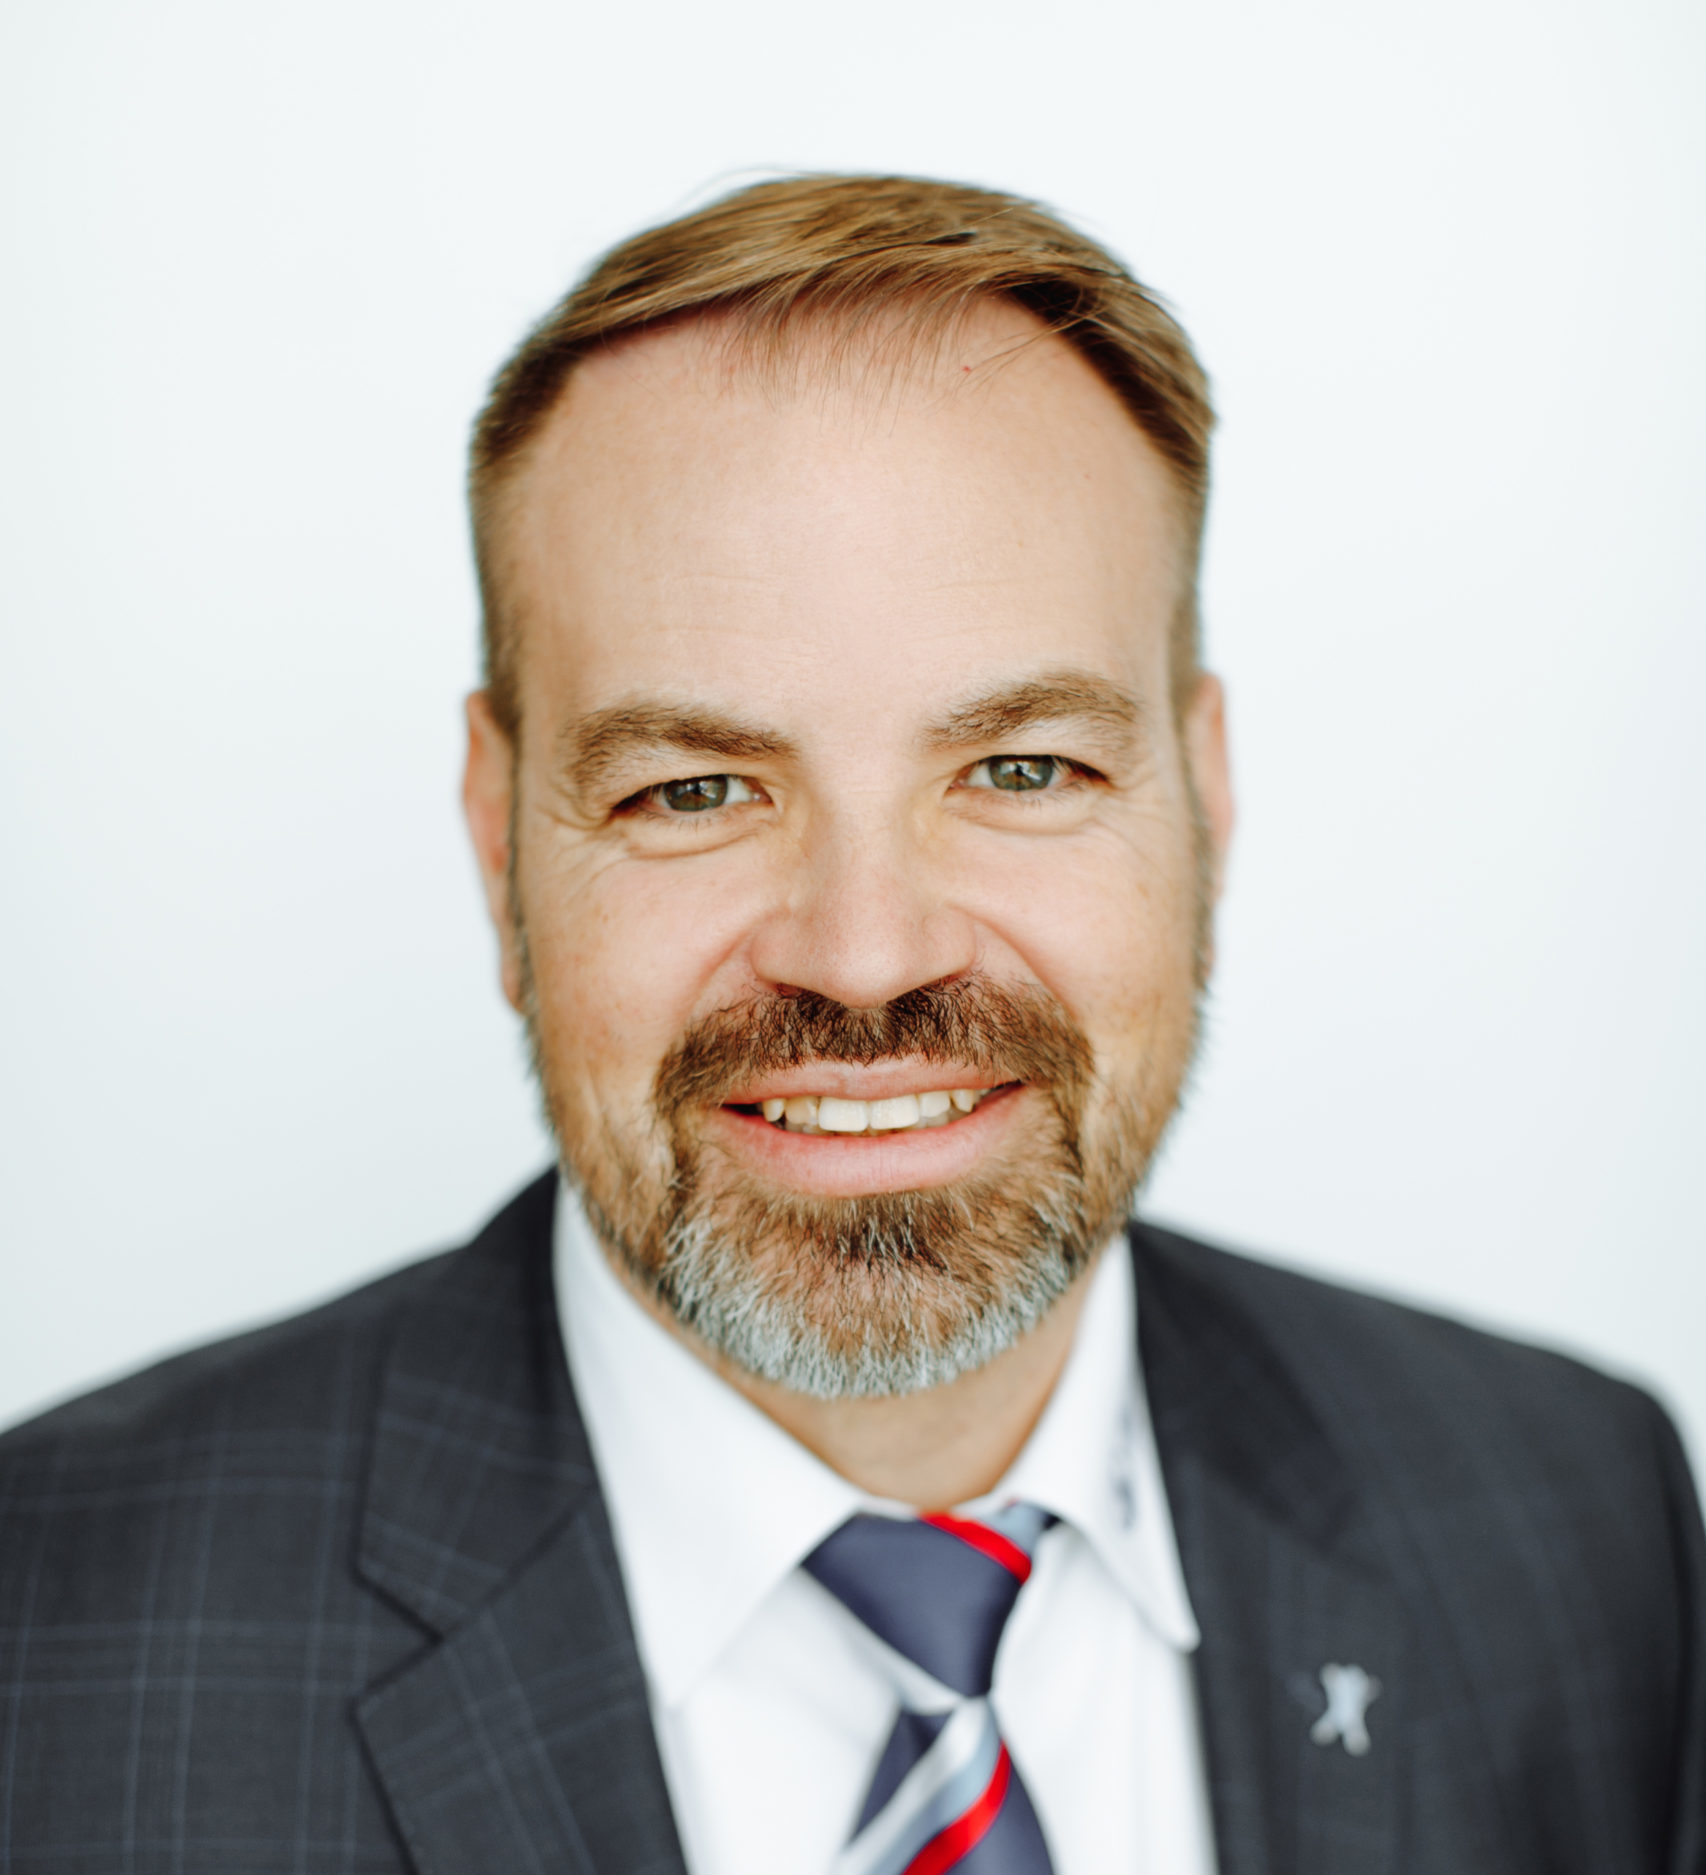 Oliver KФhncke, BФhringer